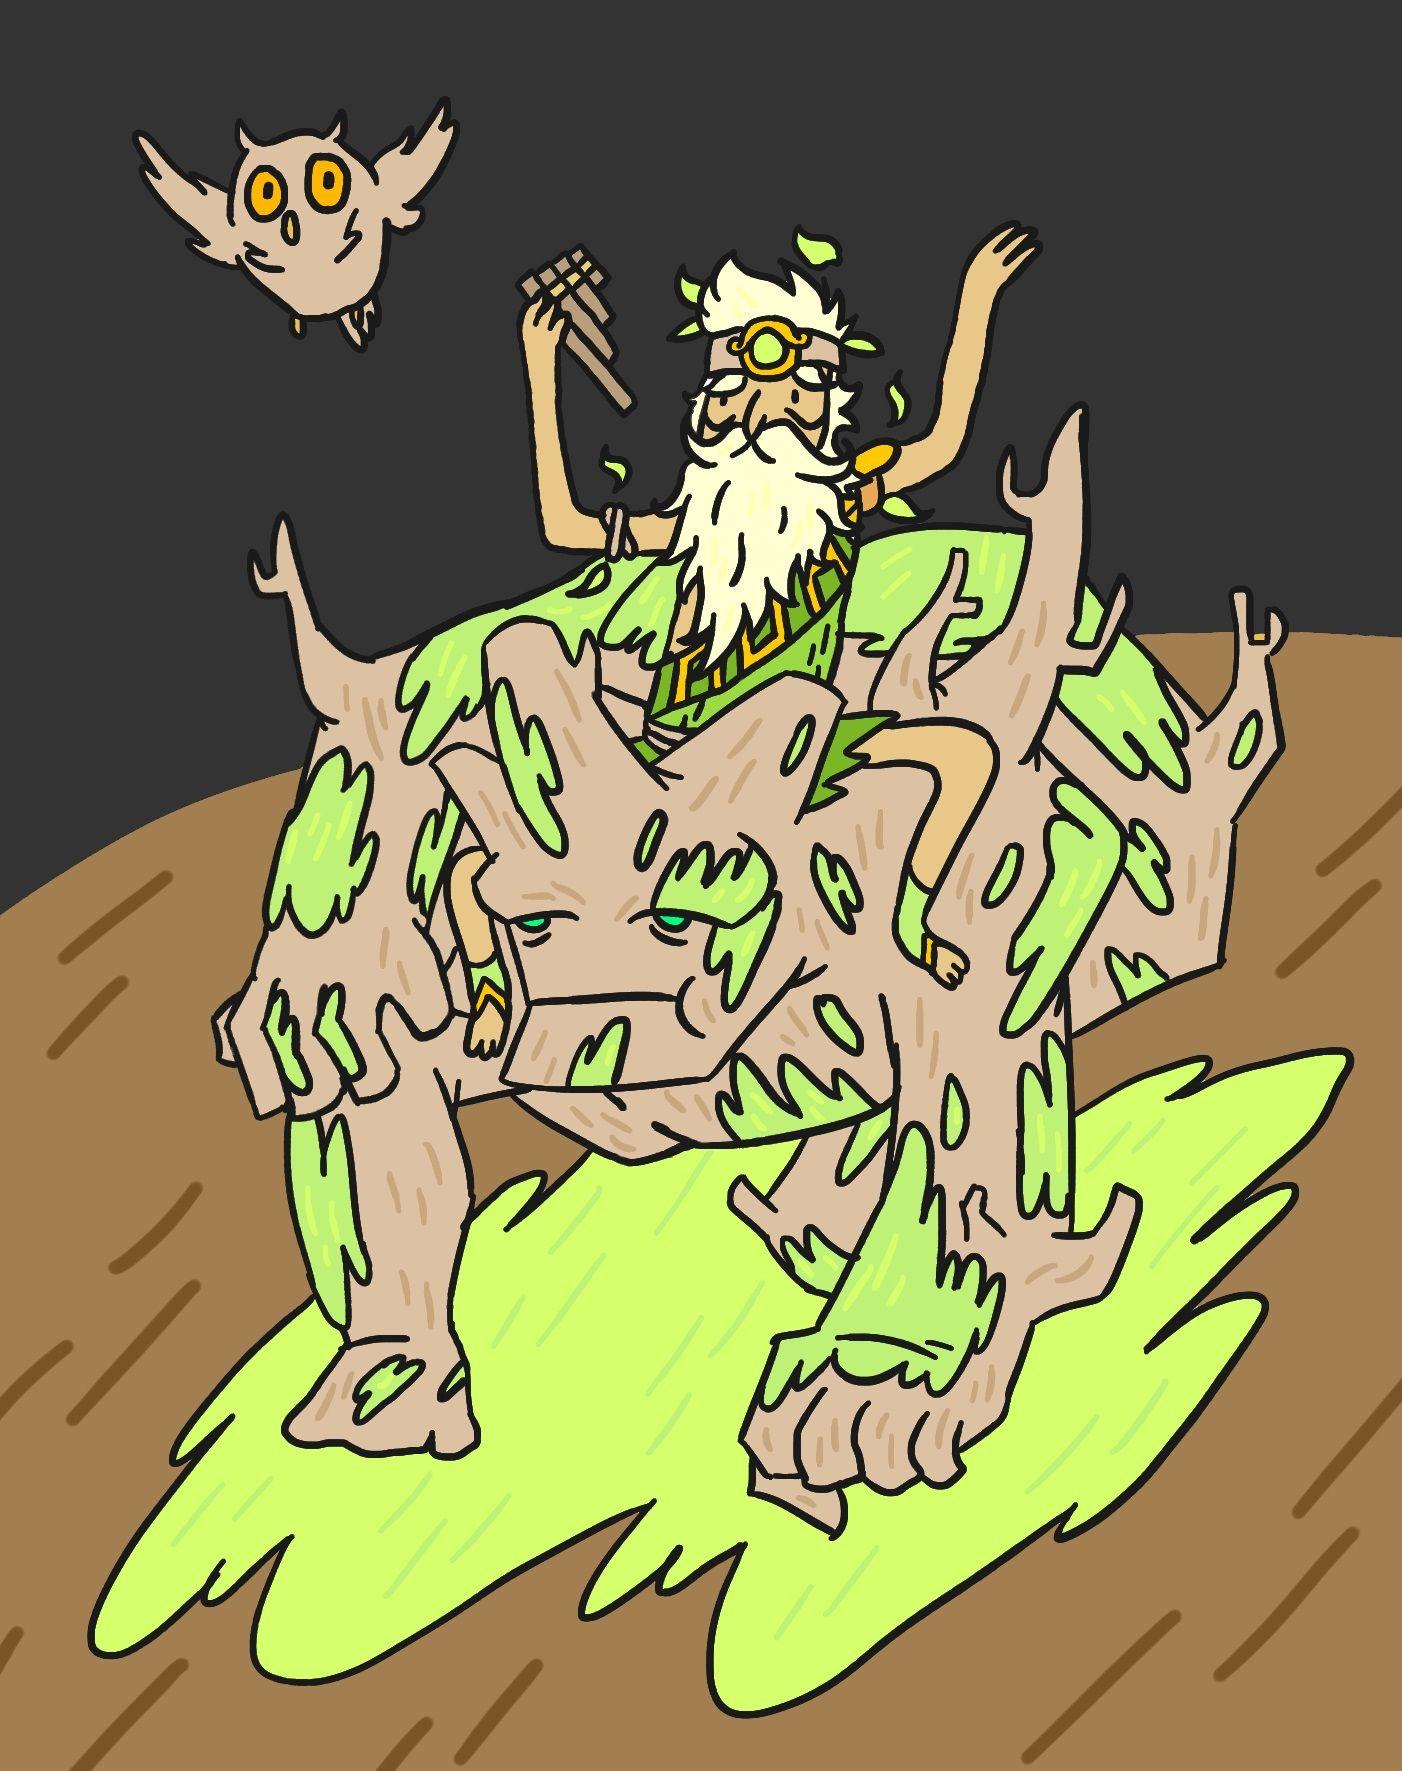 sylvanus keeper of the wild roman god from smite